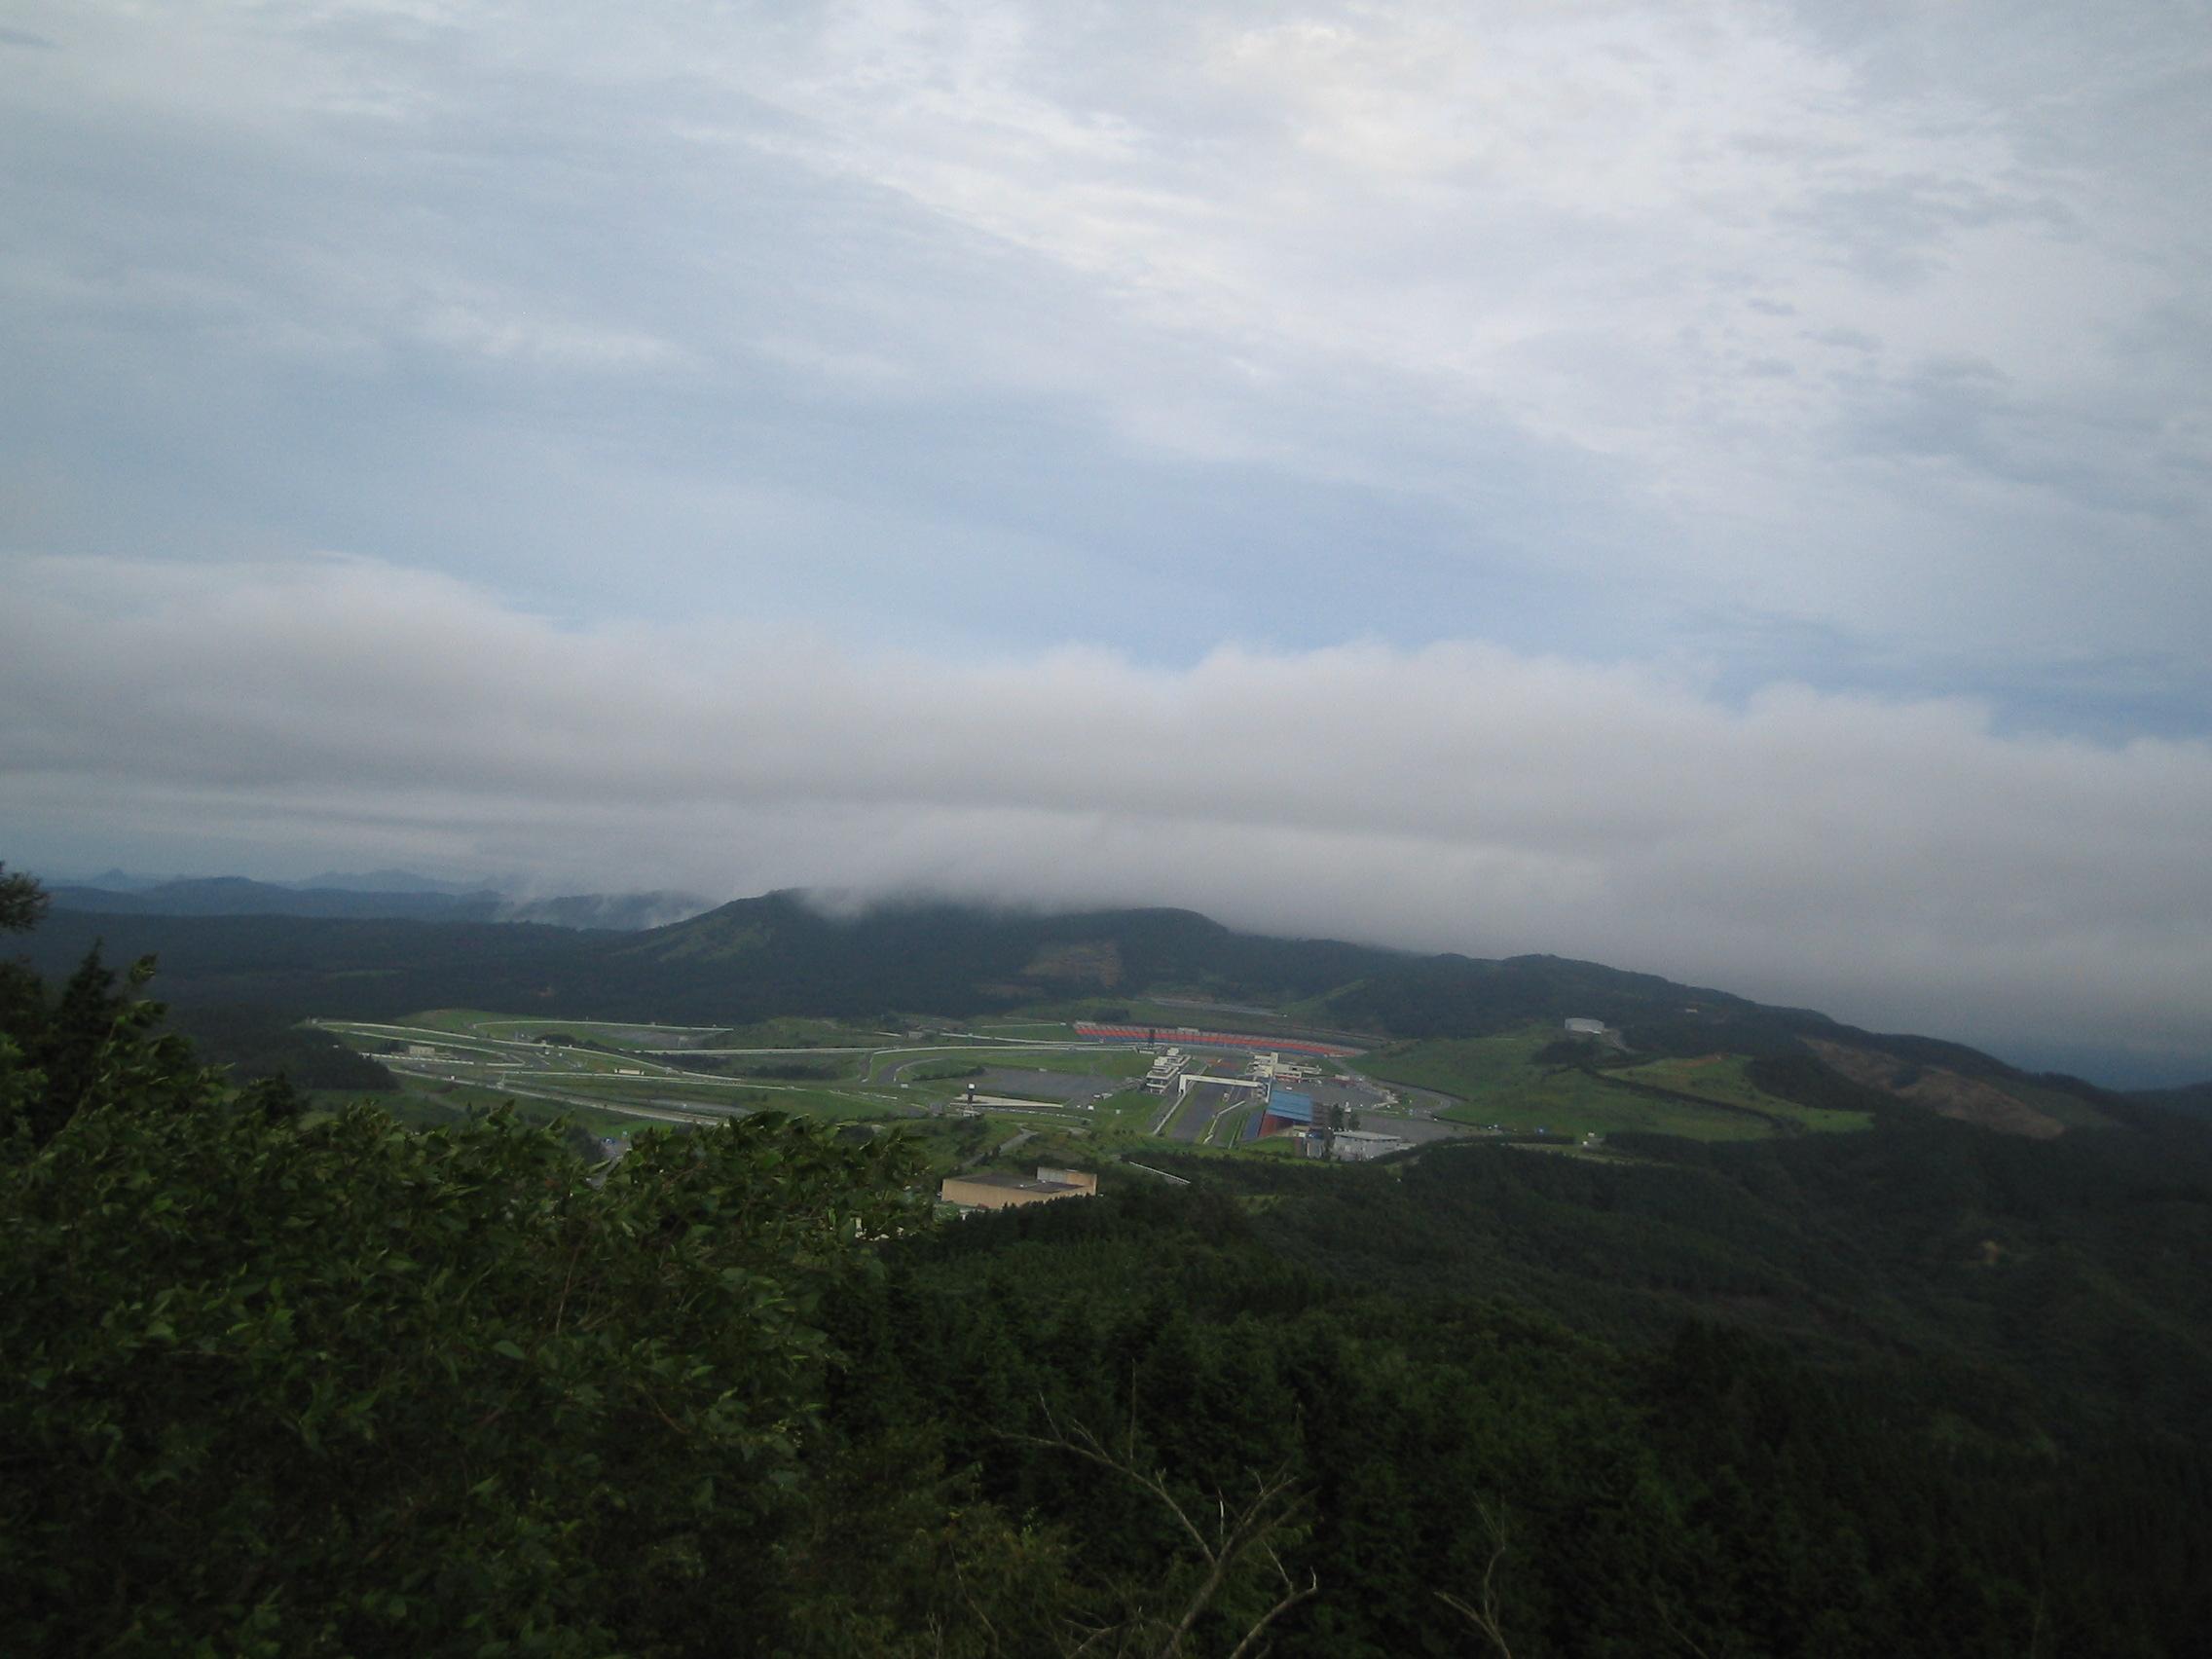 Autopolis_from_Mountainside_2007.jpg